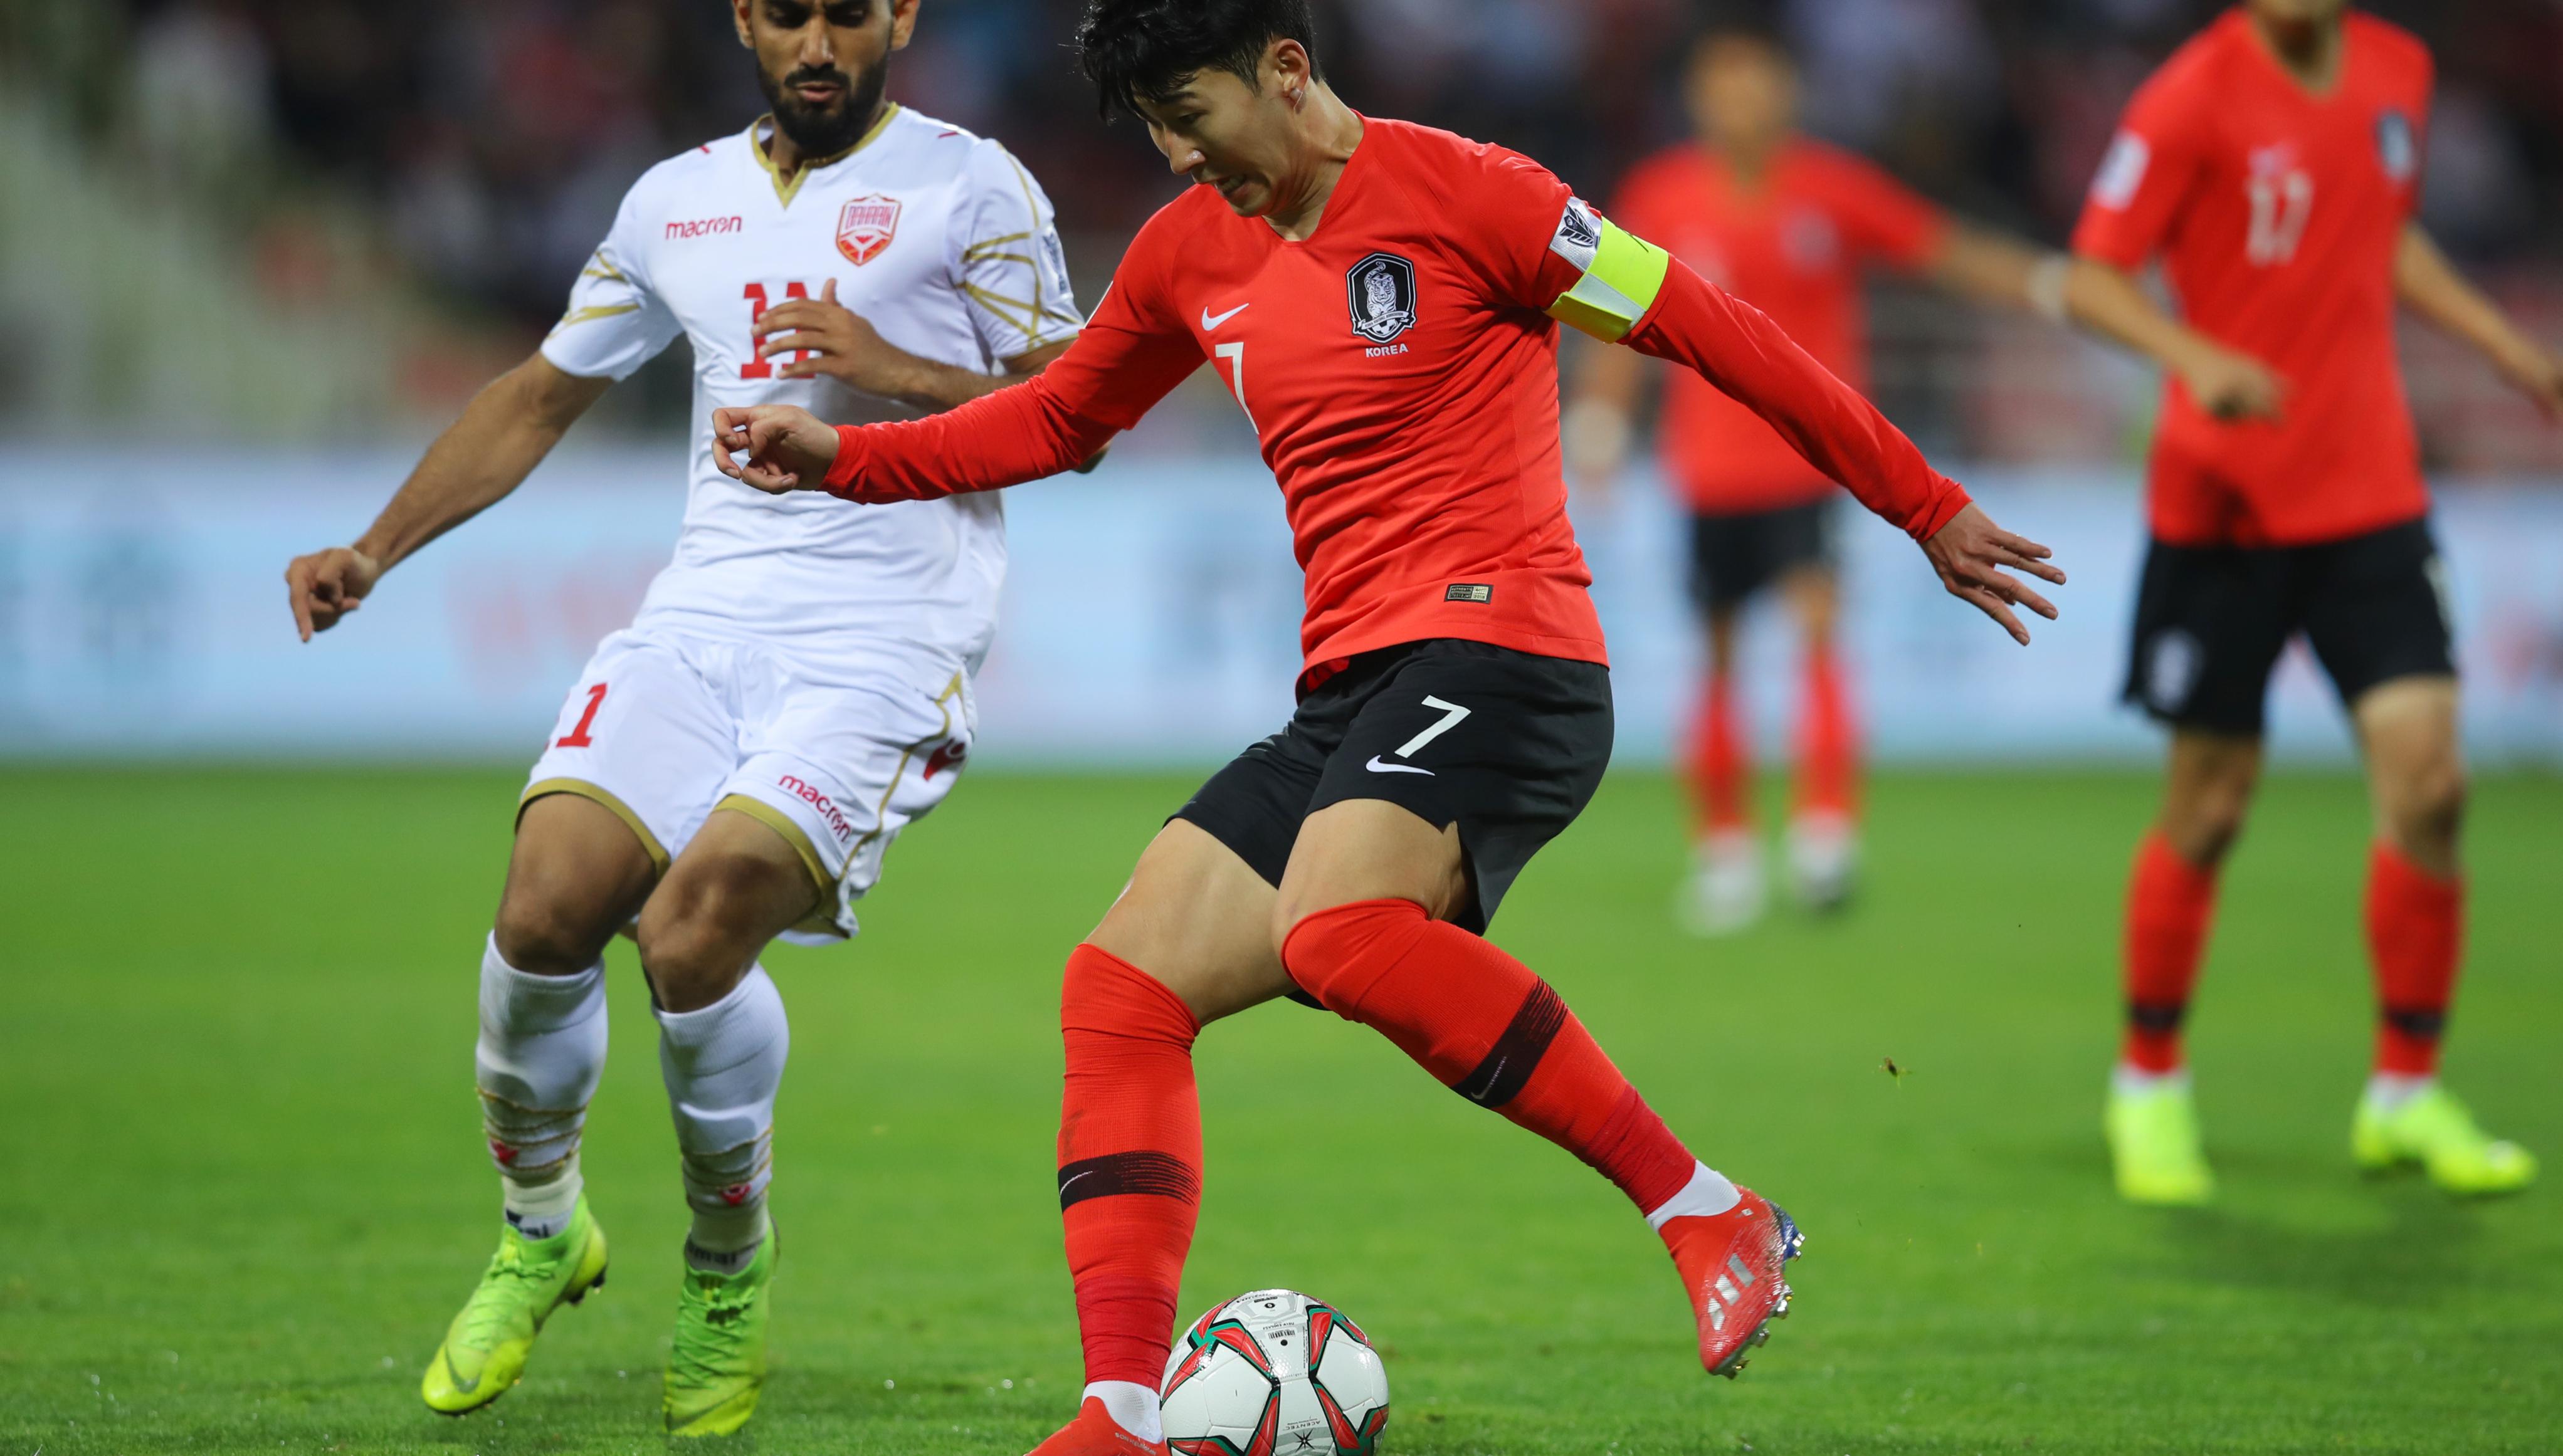 Asian Cup 2019: Tottenham star Son Heung-min does not feel